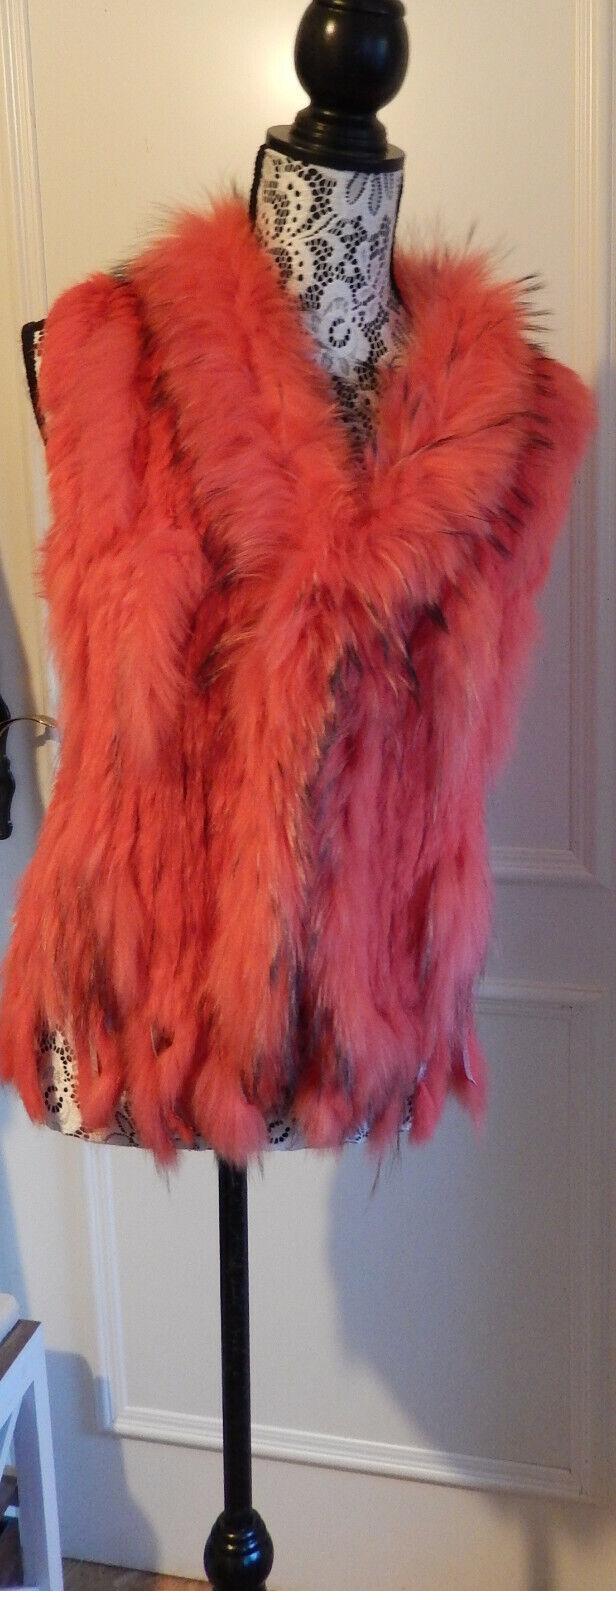 Pelz Weste lachsfarben  Kanin Murmeltier L XL  salmon colourotRabbit Marmot